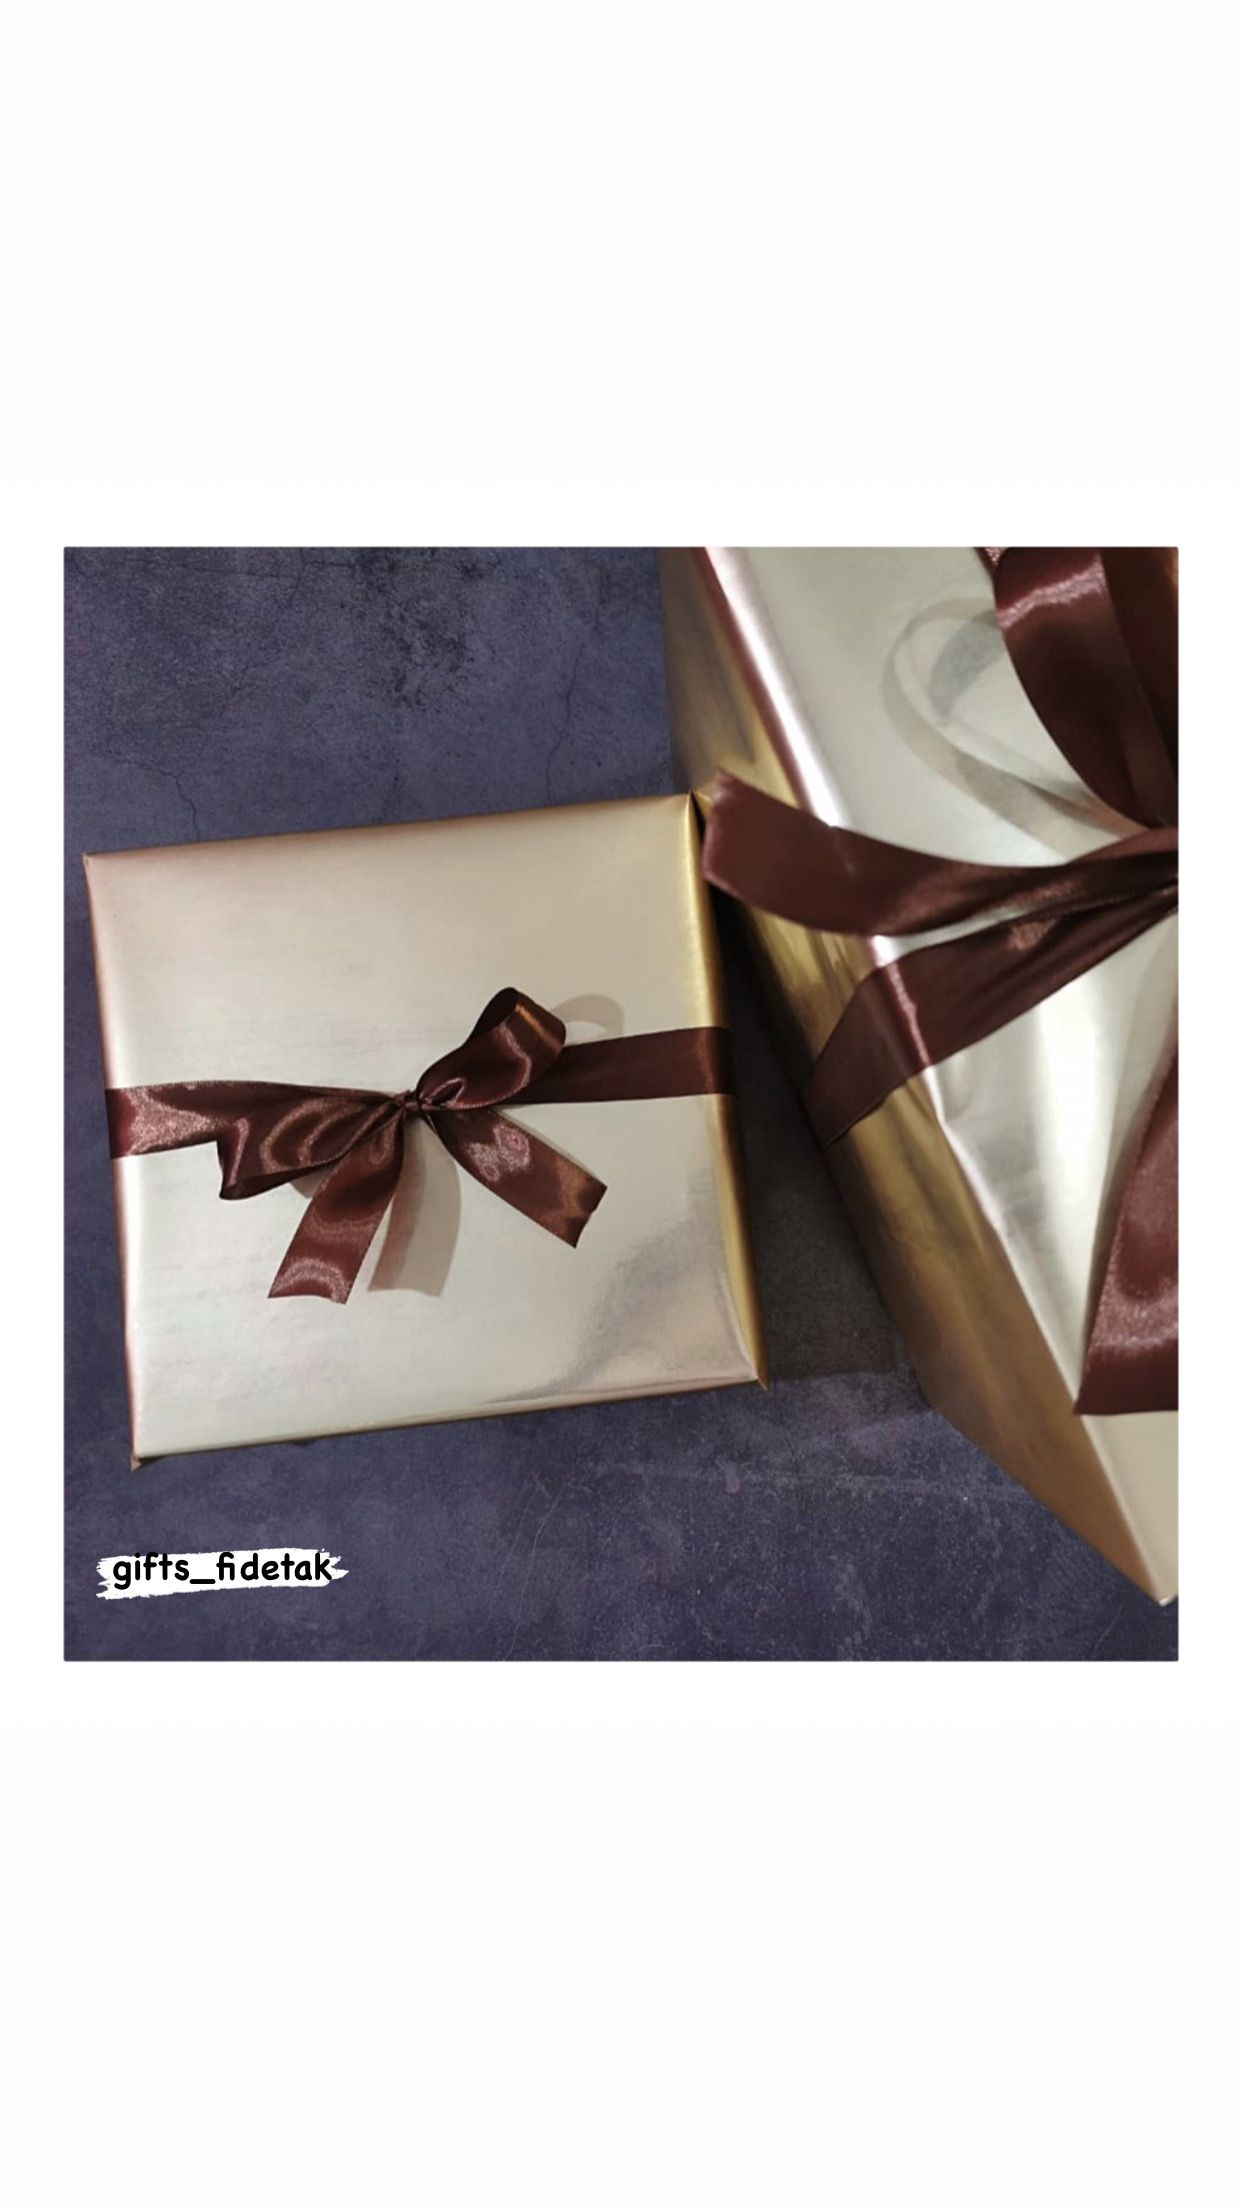 Pin By فديتك للهدايا On تغليف هدايا Gifts Napkin Rings Decor